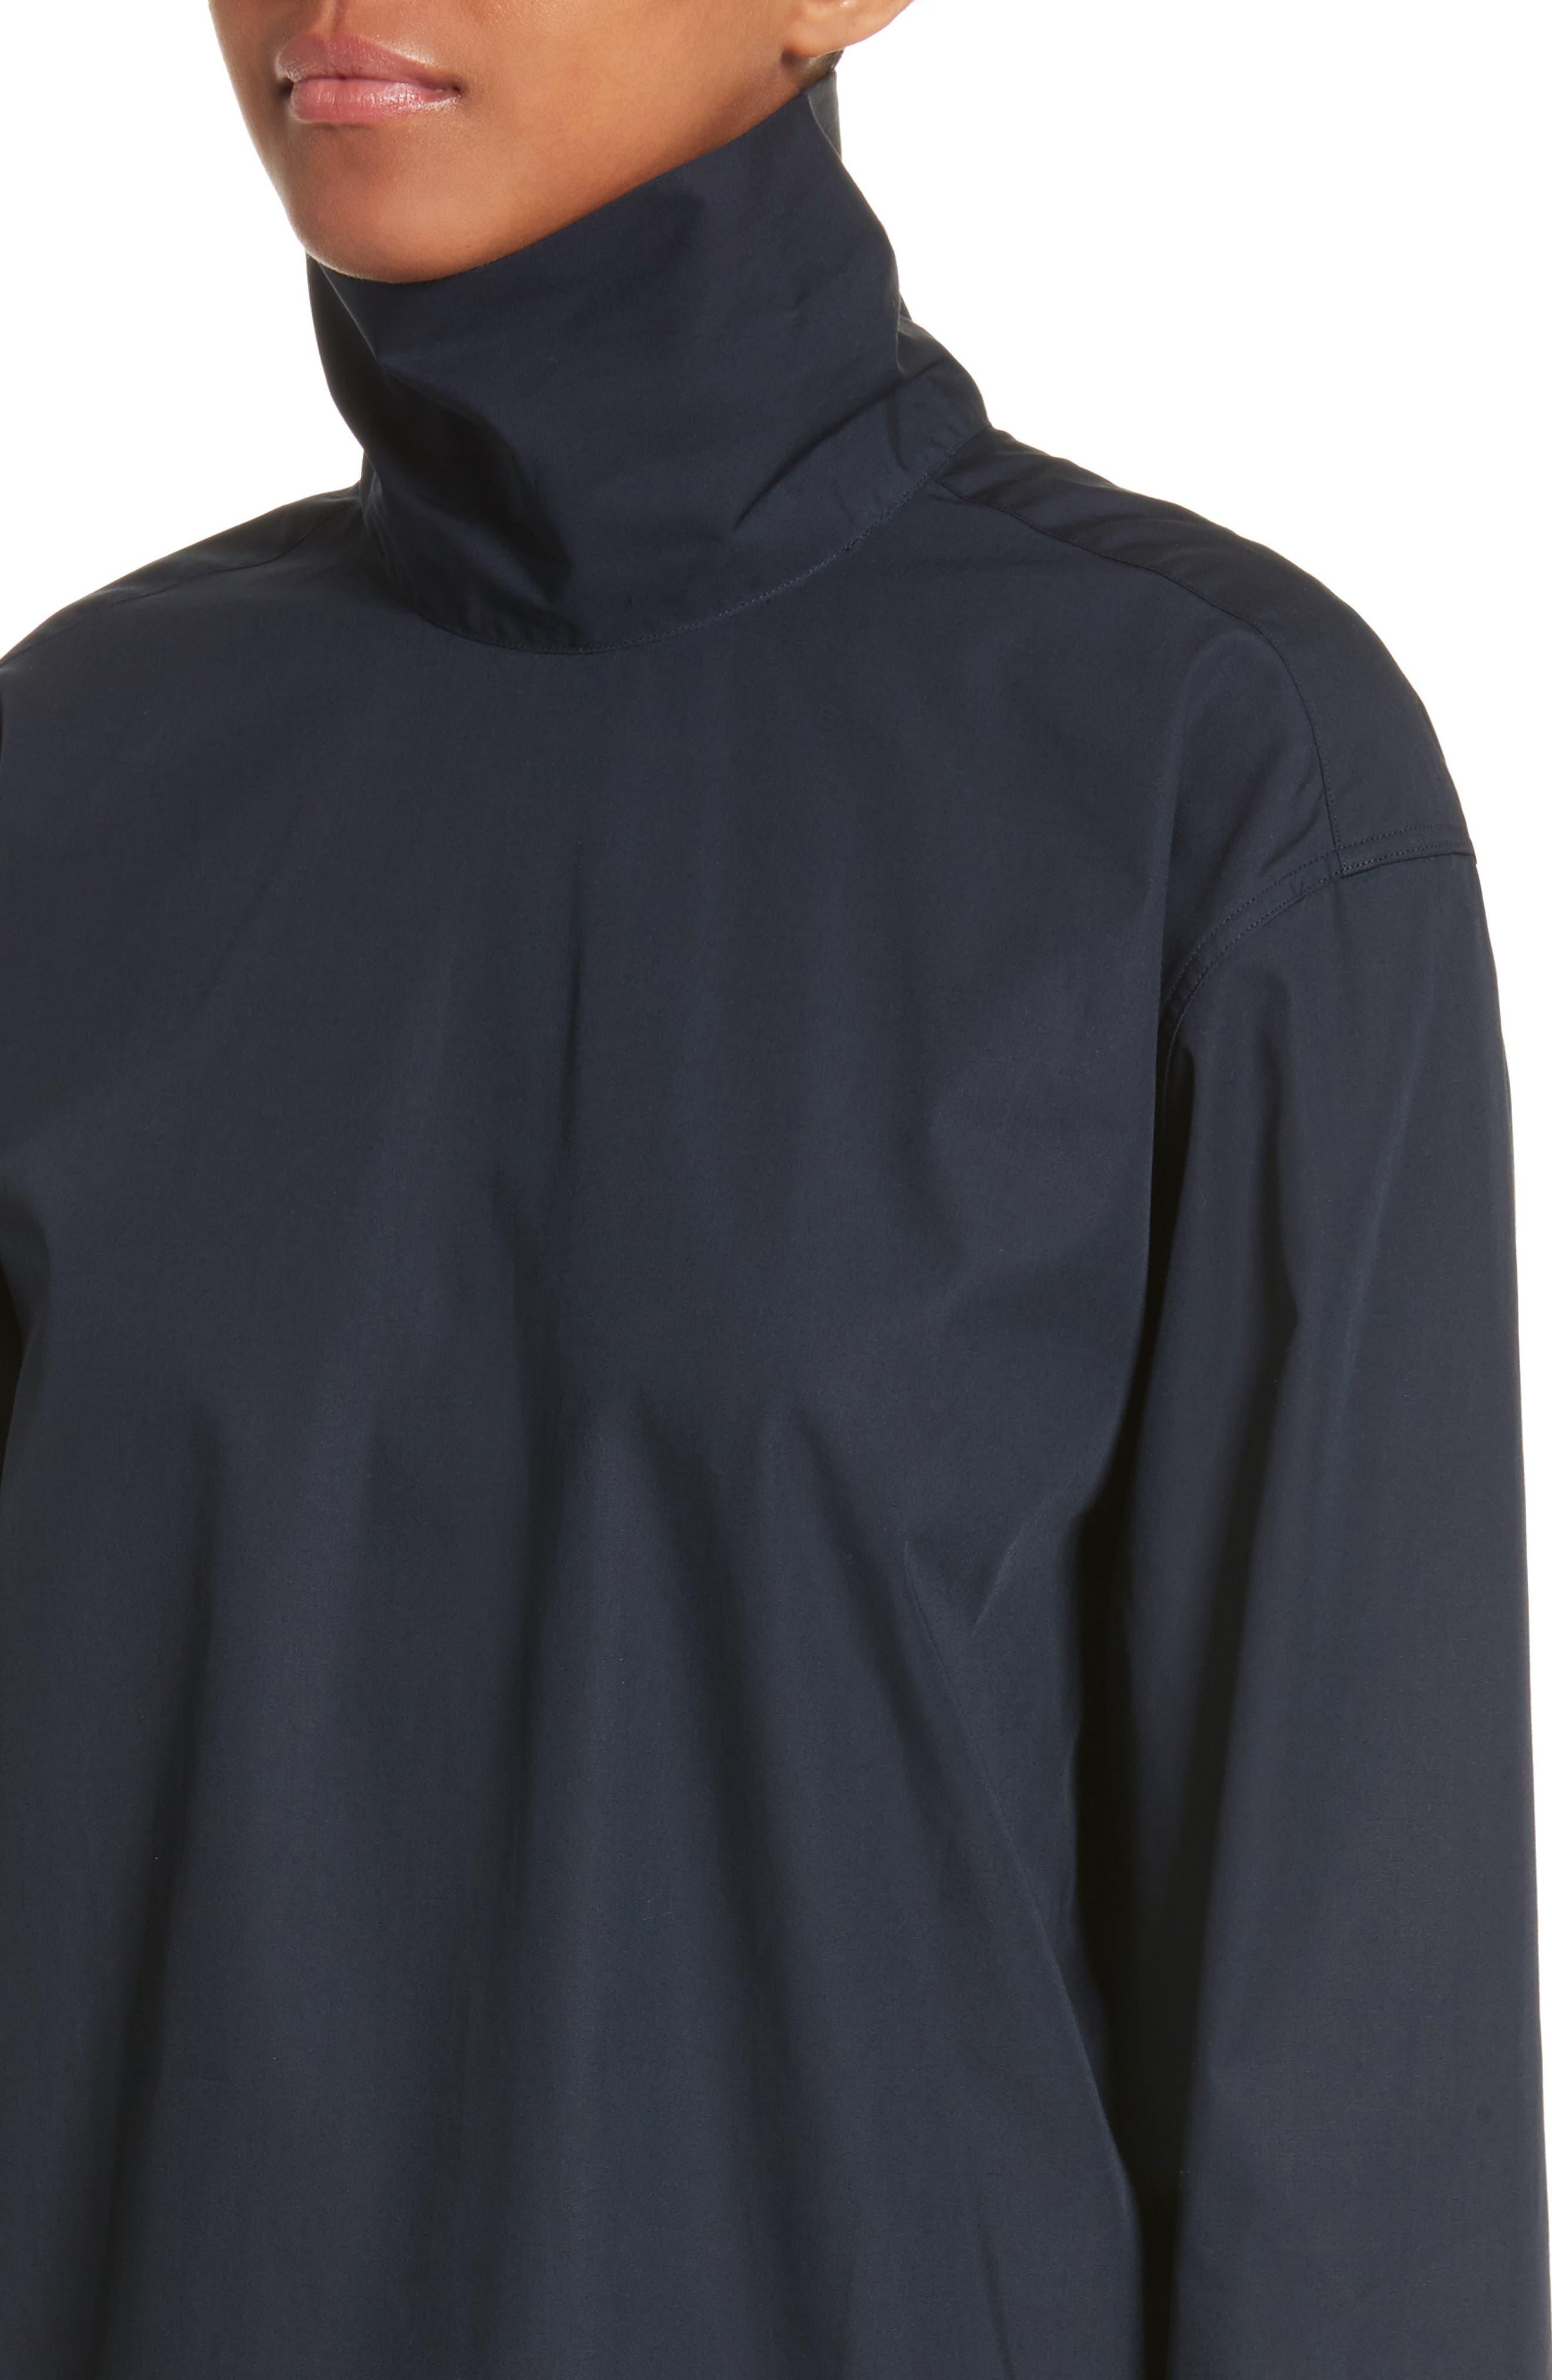 Cotton Poplin Mock Neck Shirt,                             Alternate thumbnail 4, color,                             400